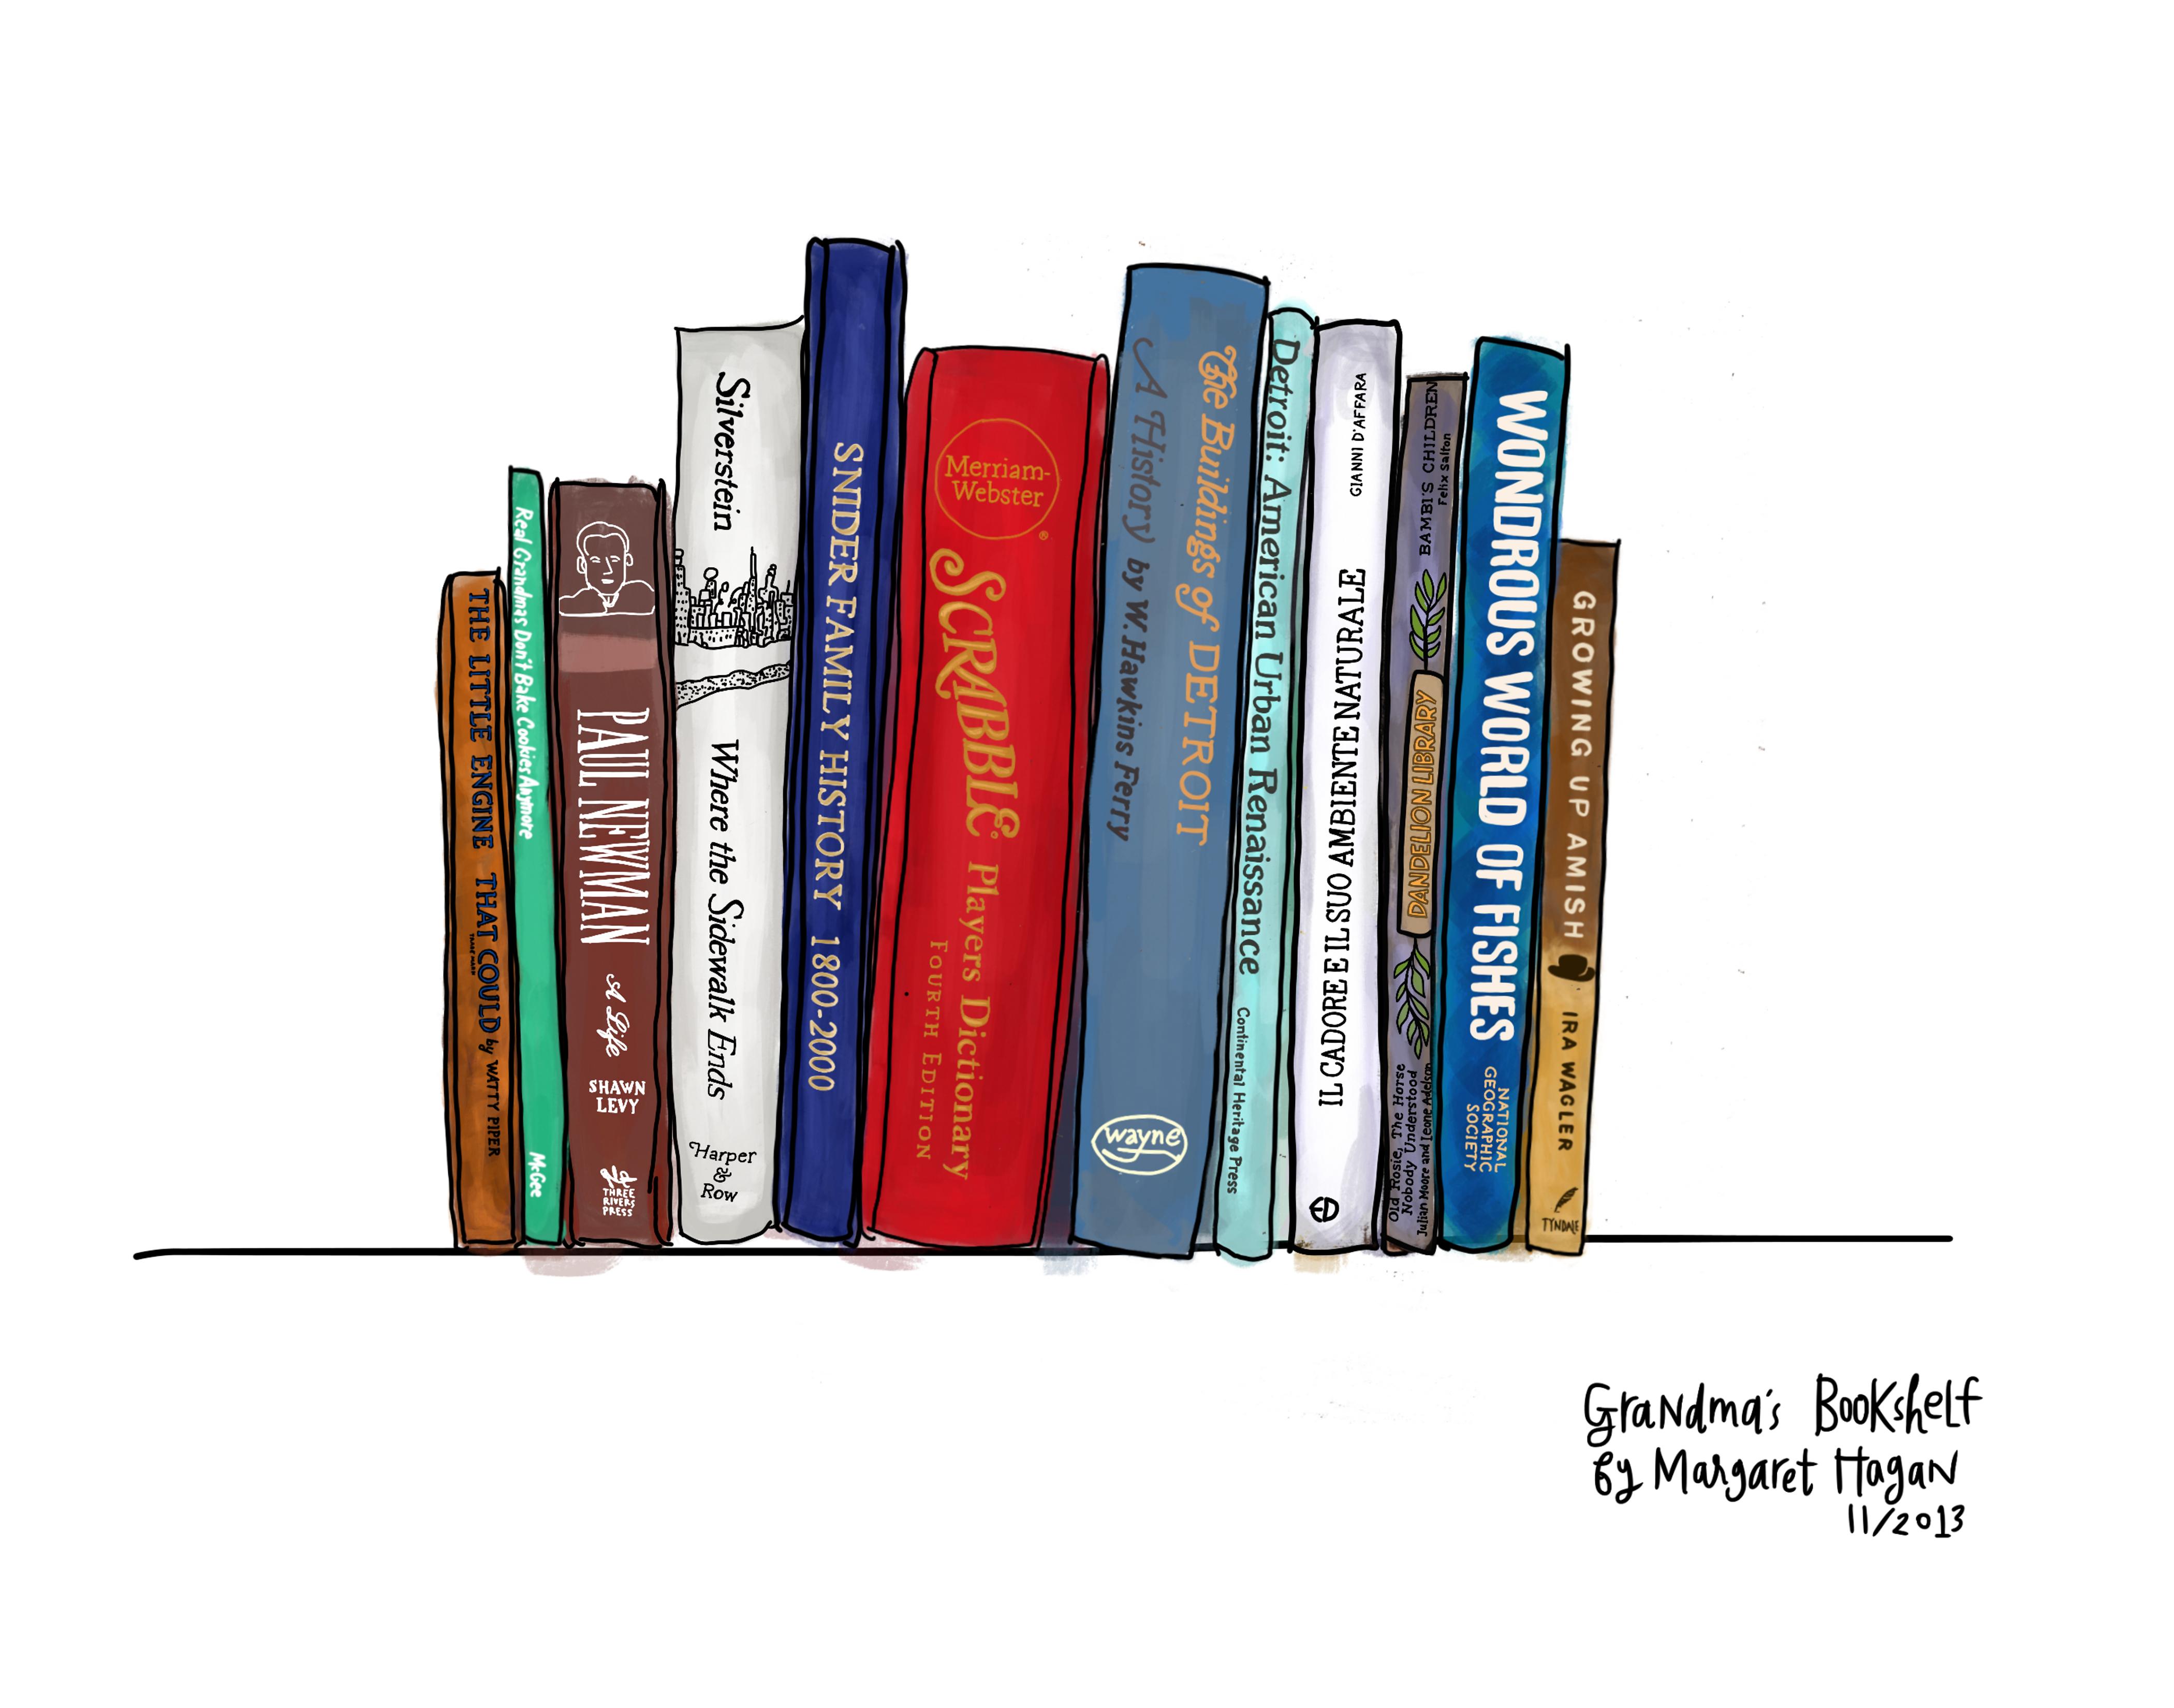 Grandmas Bookshelf 14 X 11